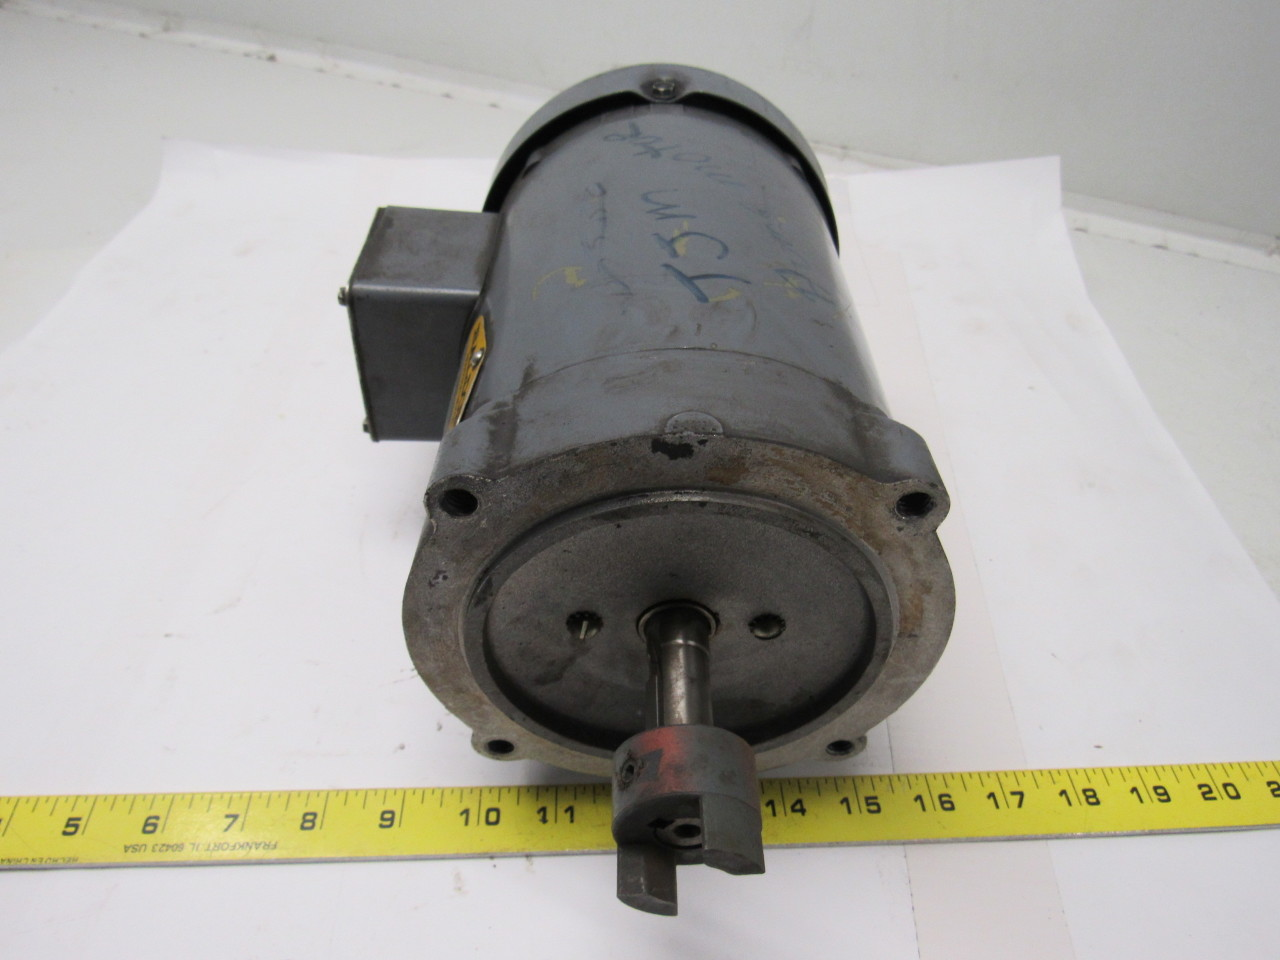 Baldor vm3538 1 2 hp electric motor 3ph 208 230 460v for 56c frame motor dimensions